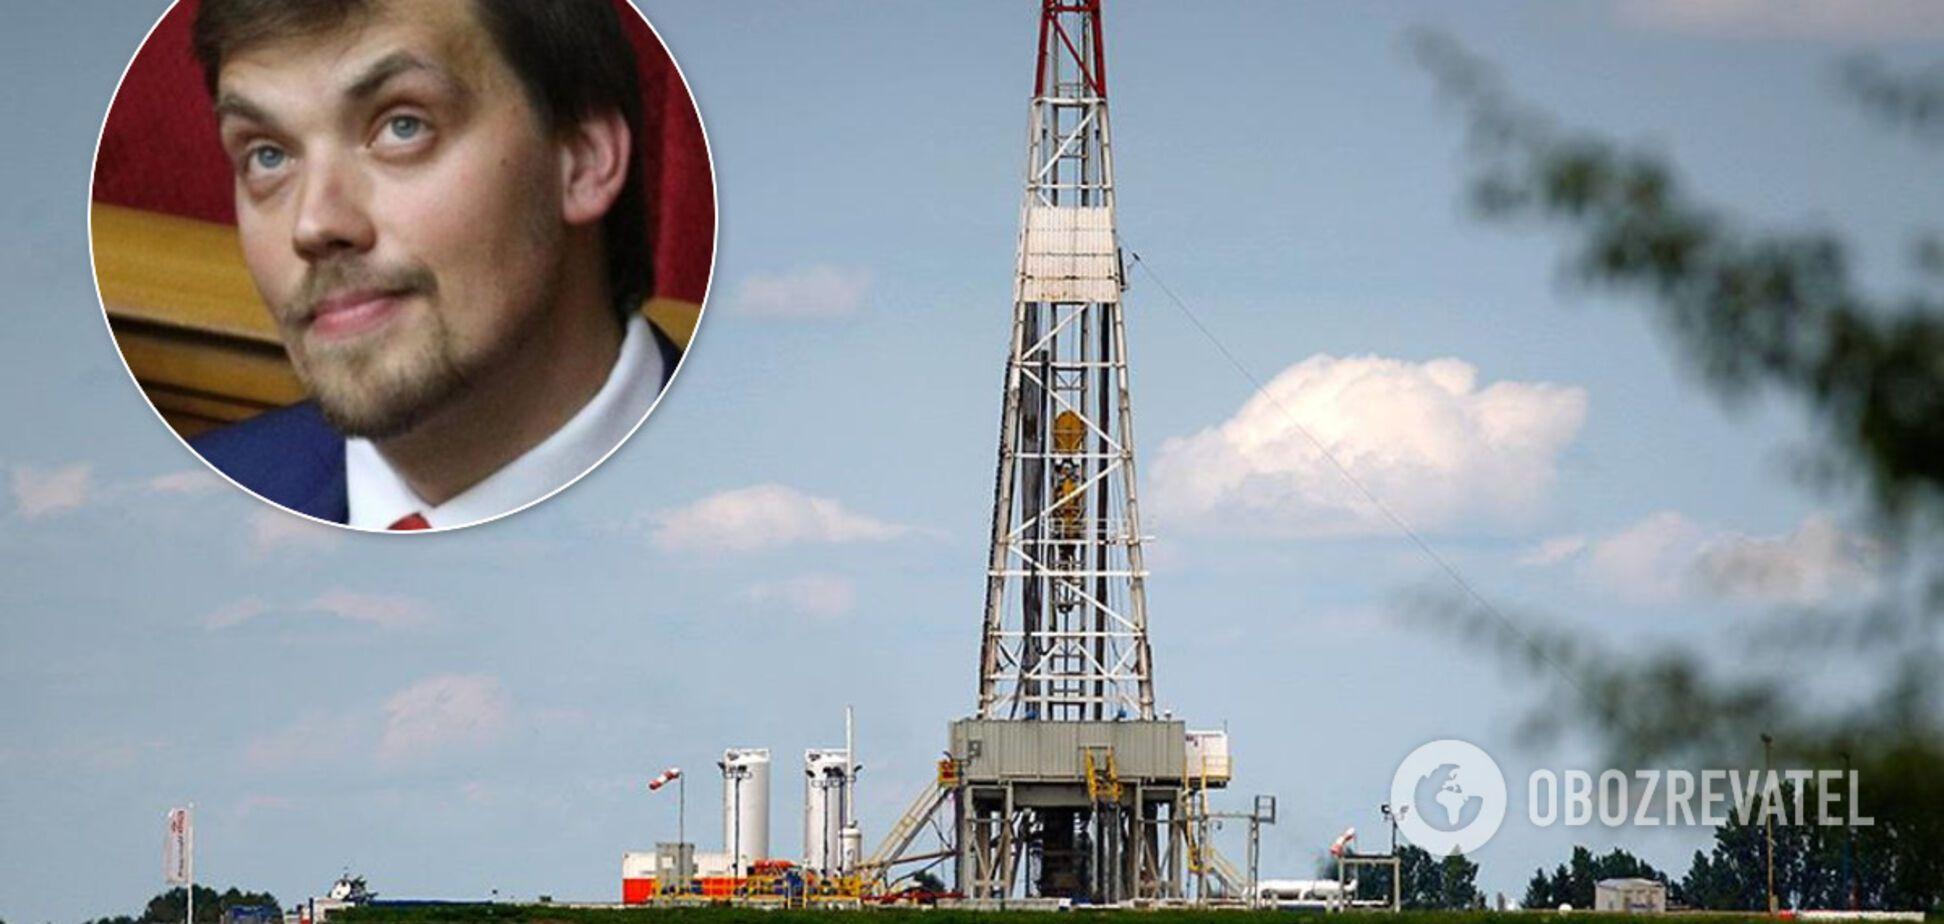 Україна наростить видобуток газу: Гончарук поставив амбітне завдання